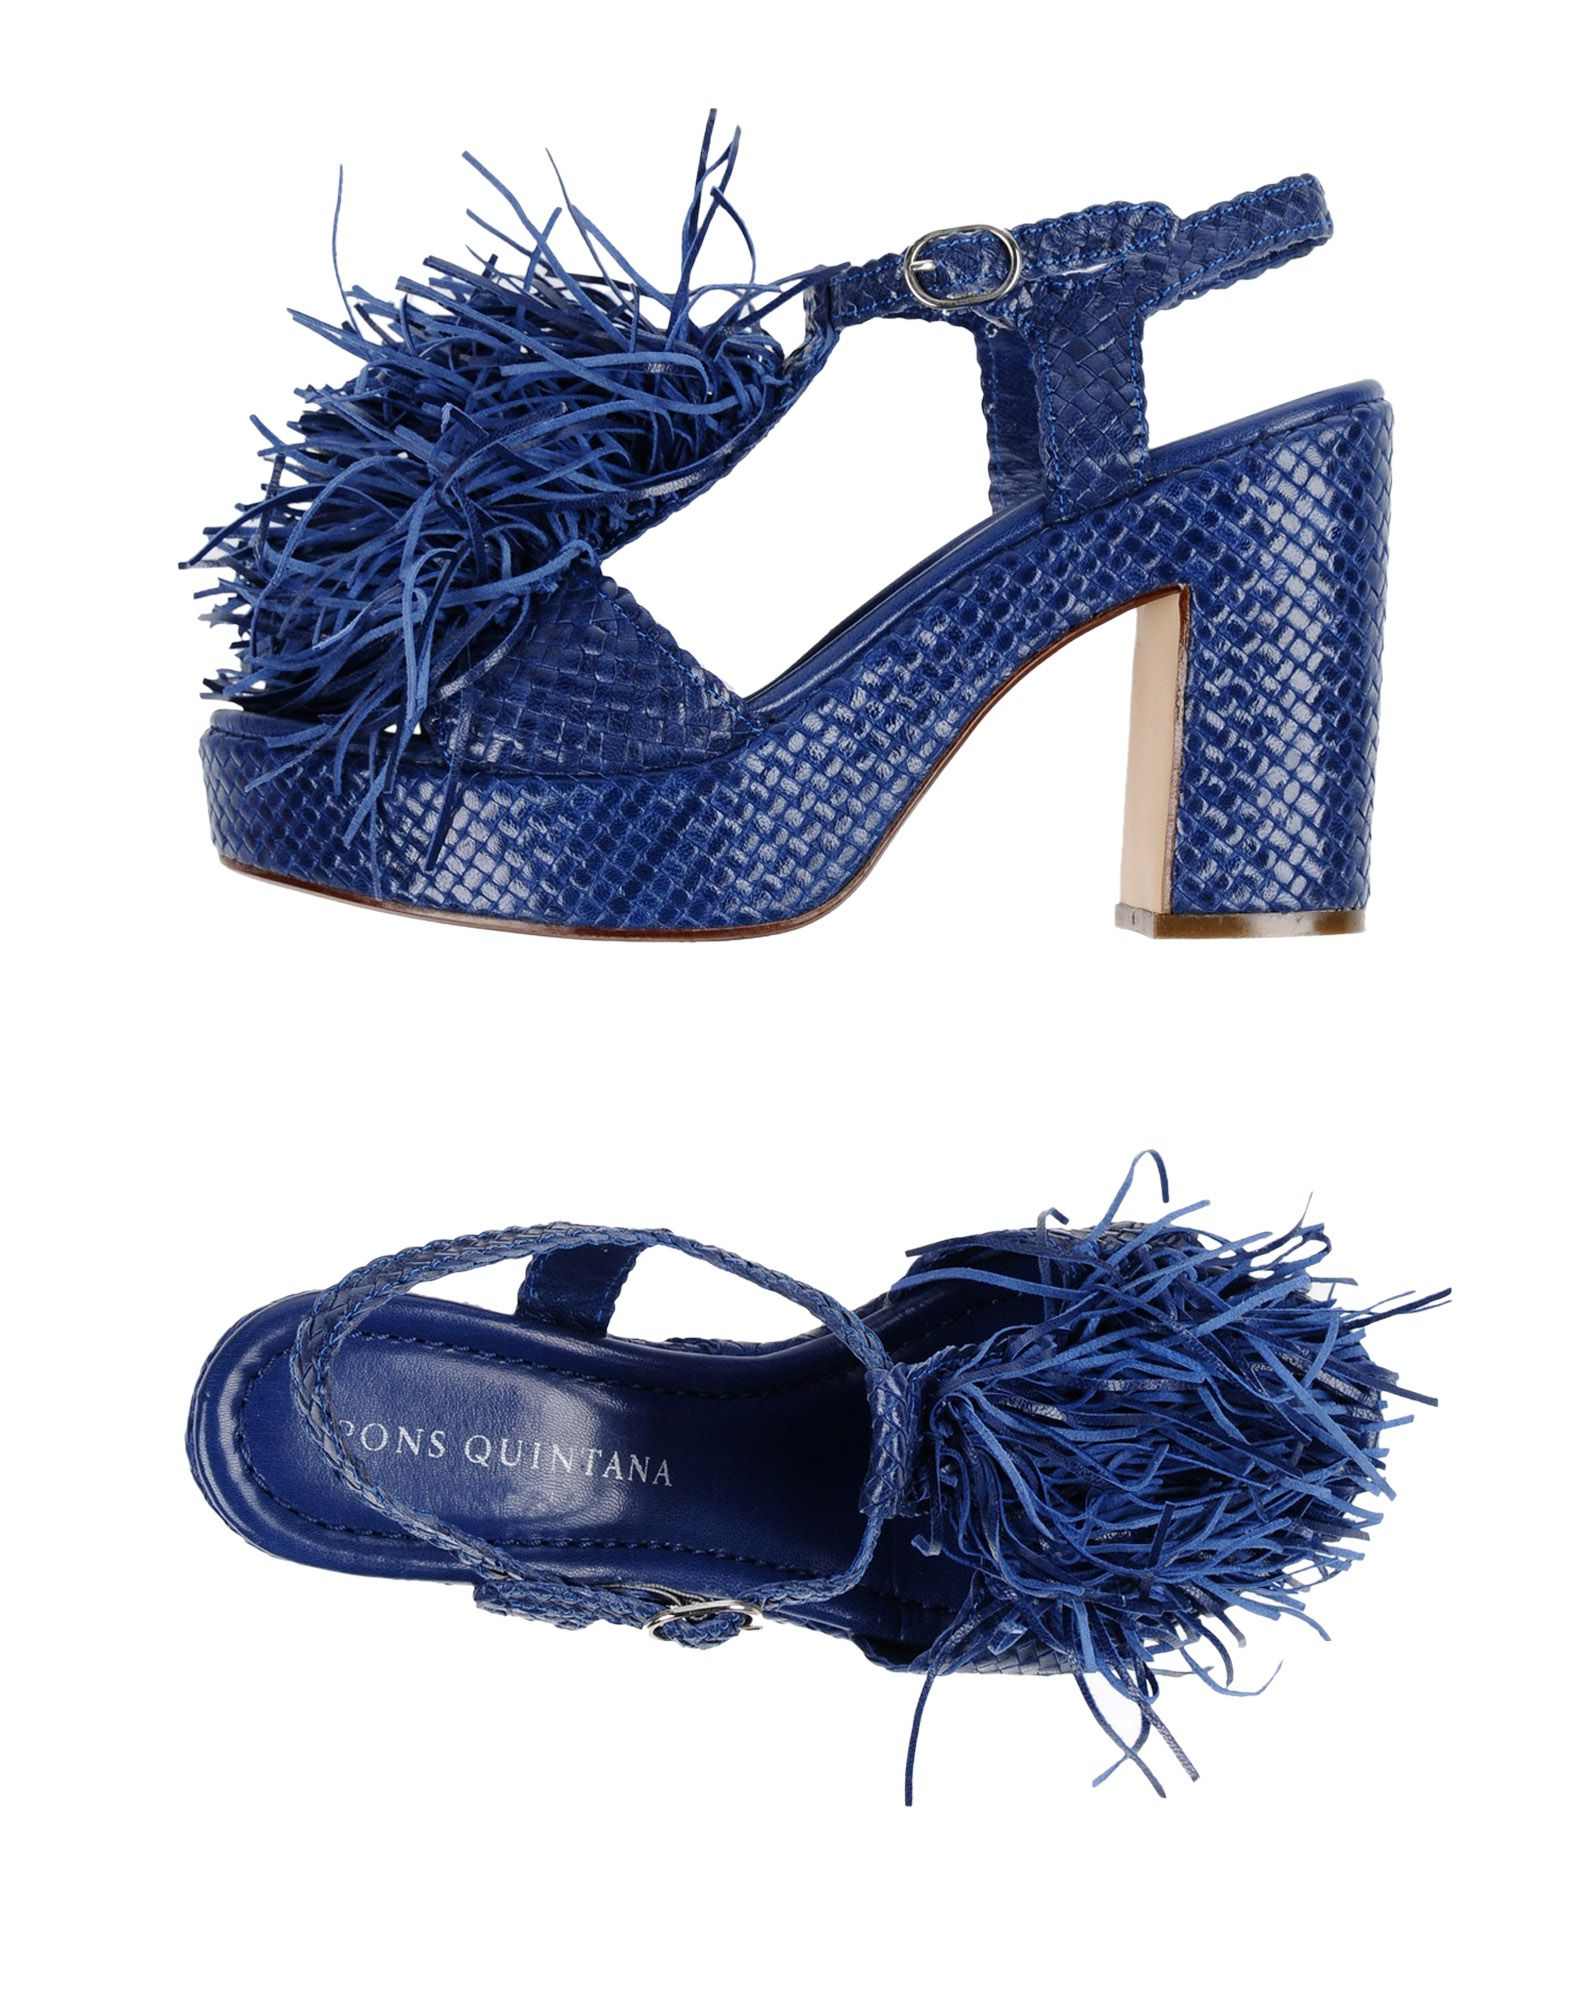 Stilvolle billige Schuhe Pons Quintana Sandalen Damen  11365074RX